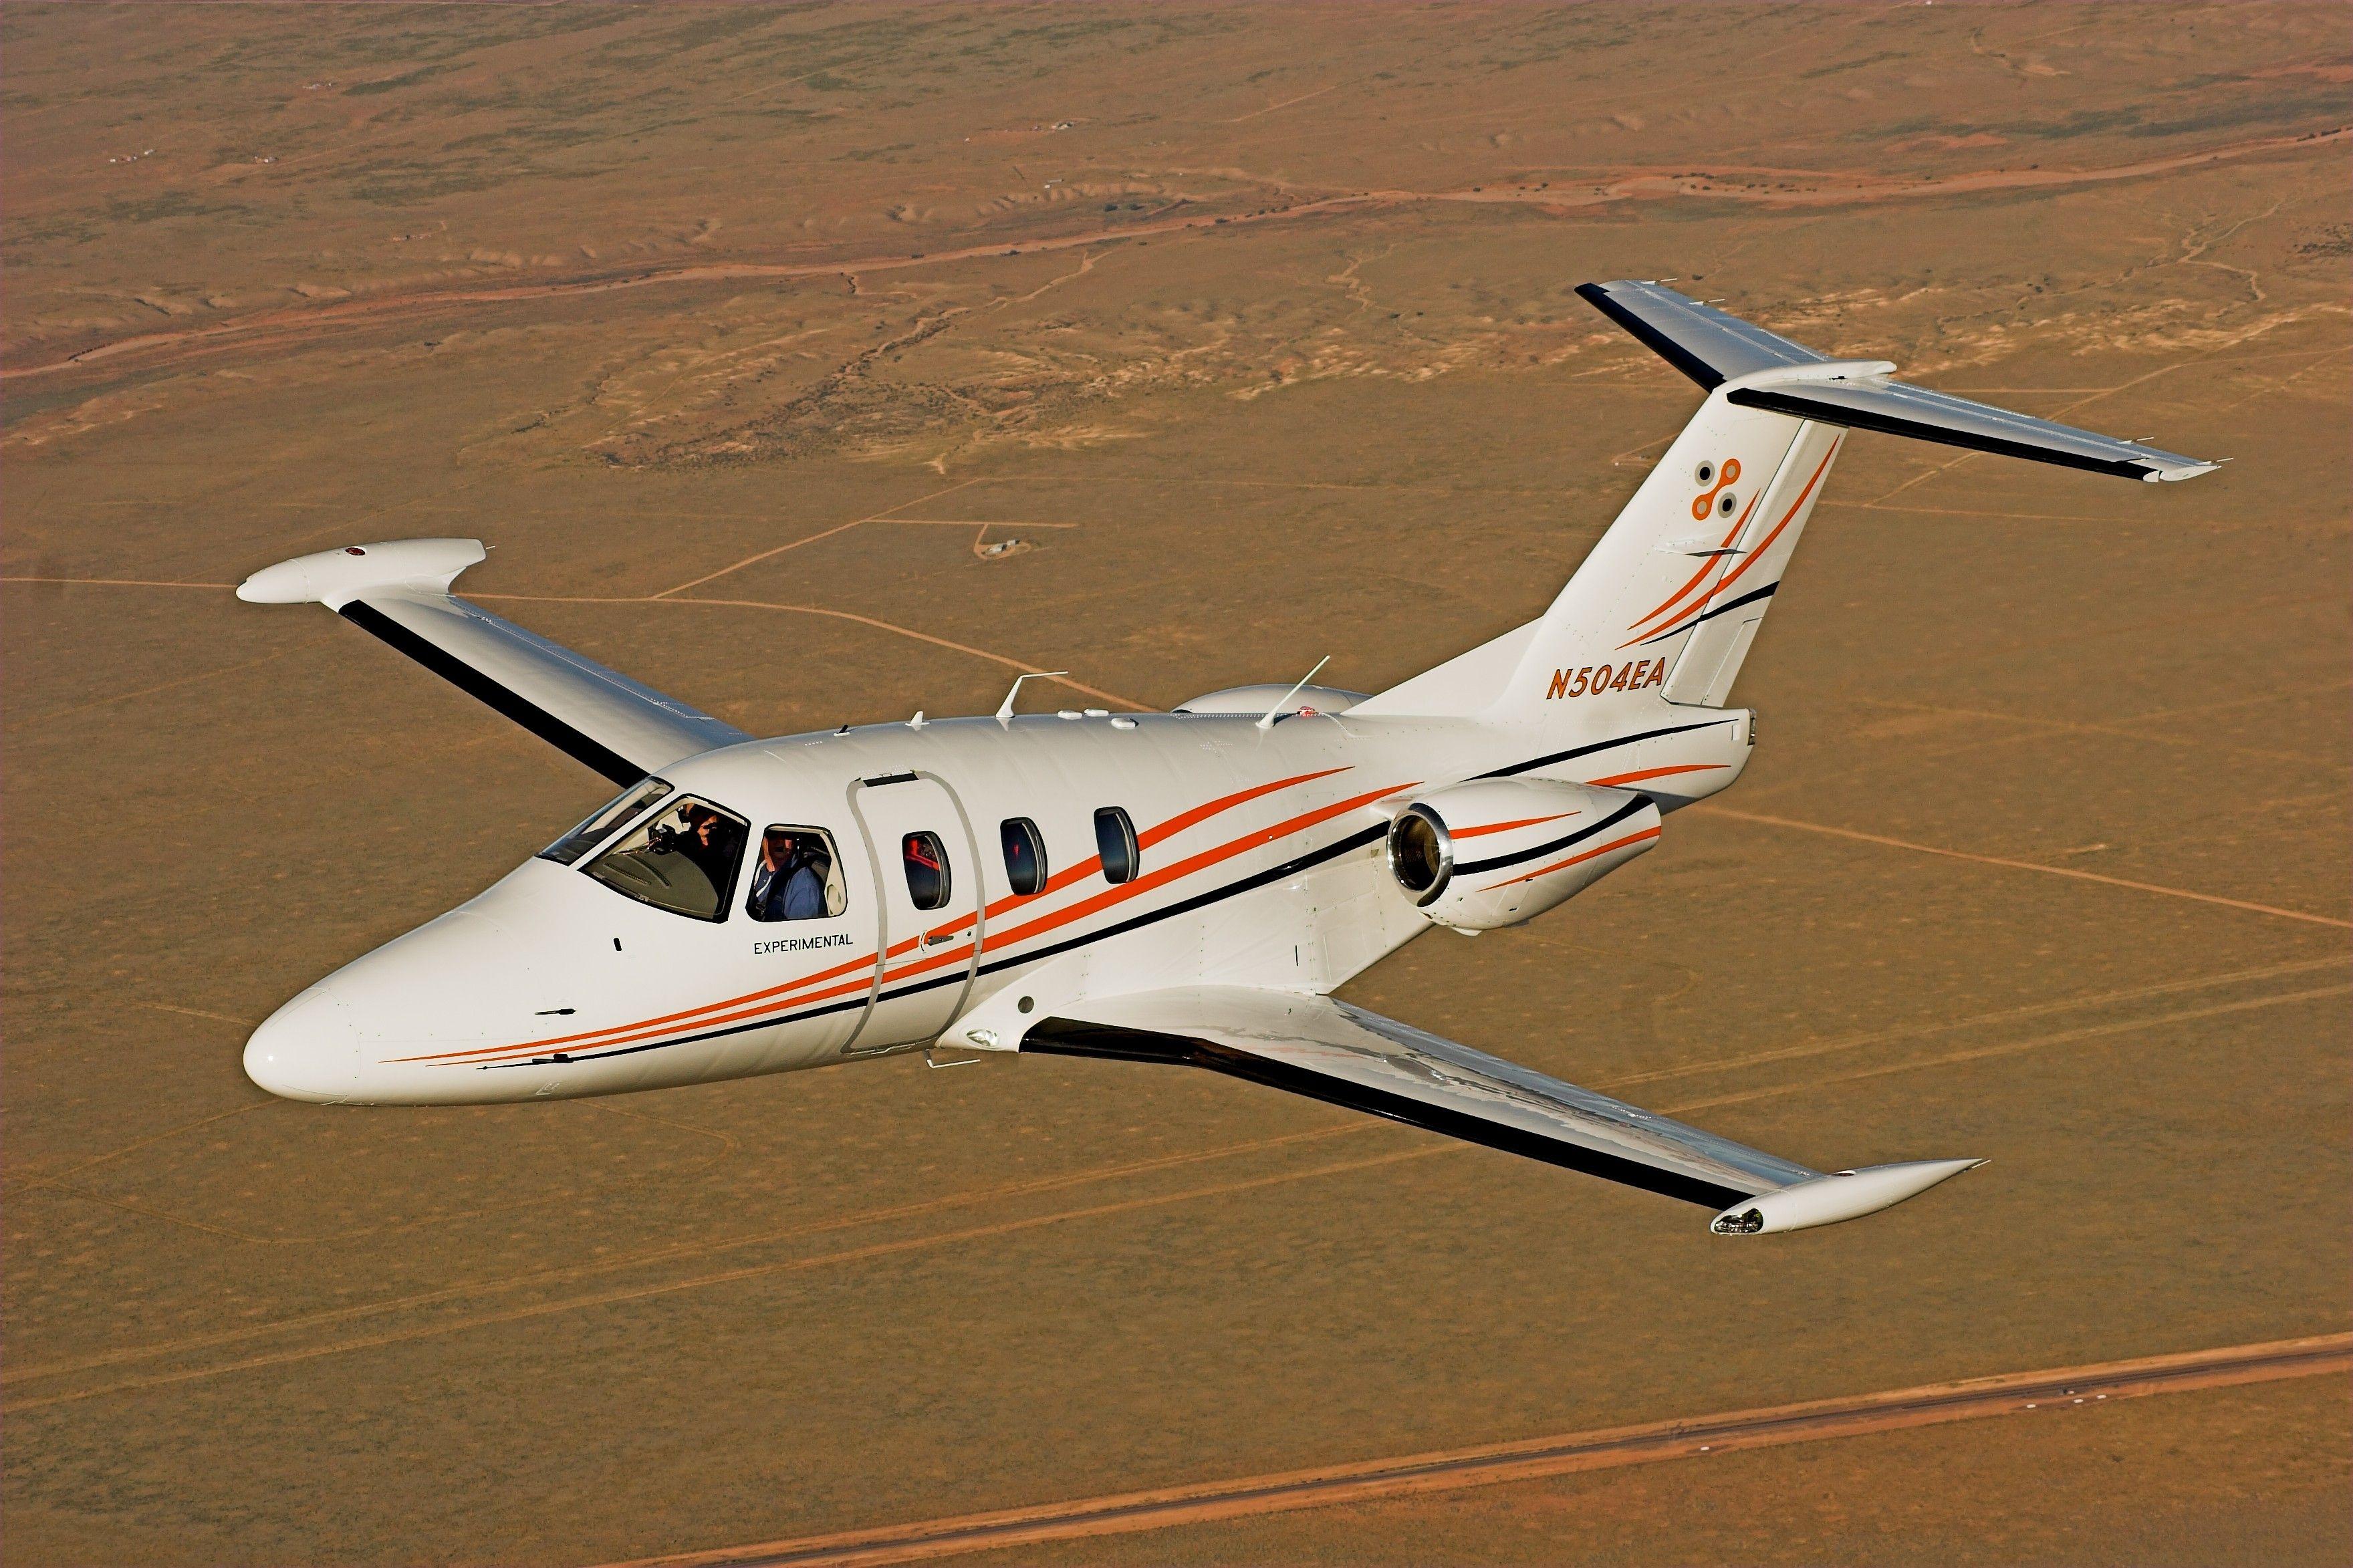 Eclipse 500 Jet Jet aviation, Jet, Private jet